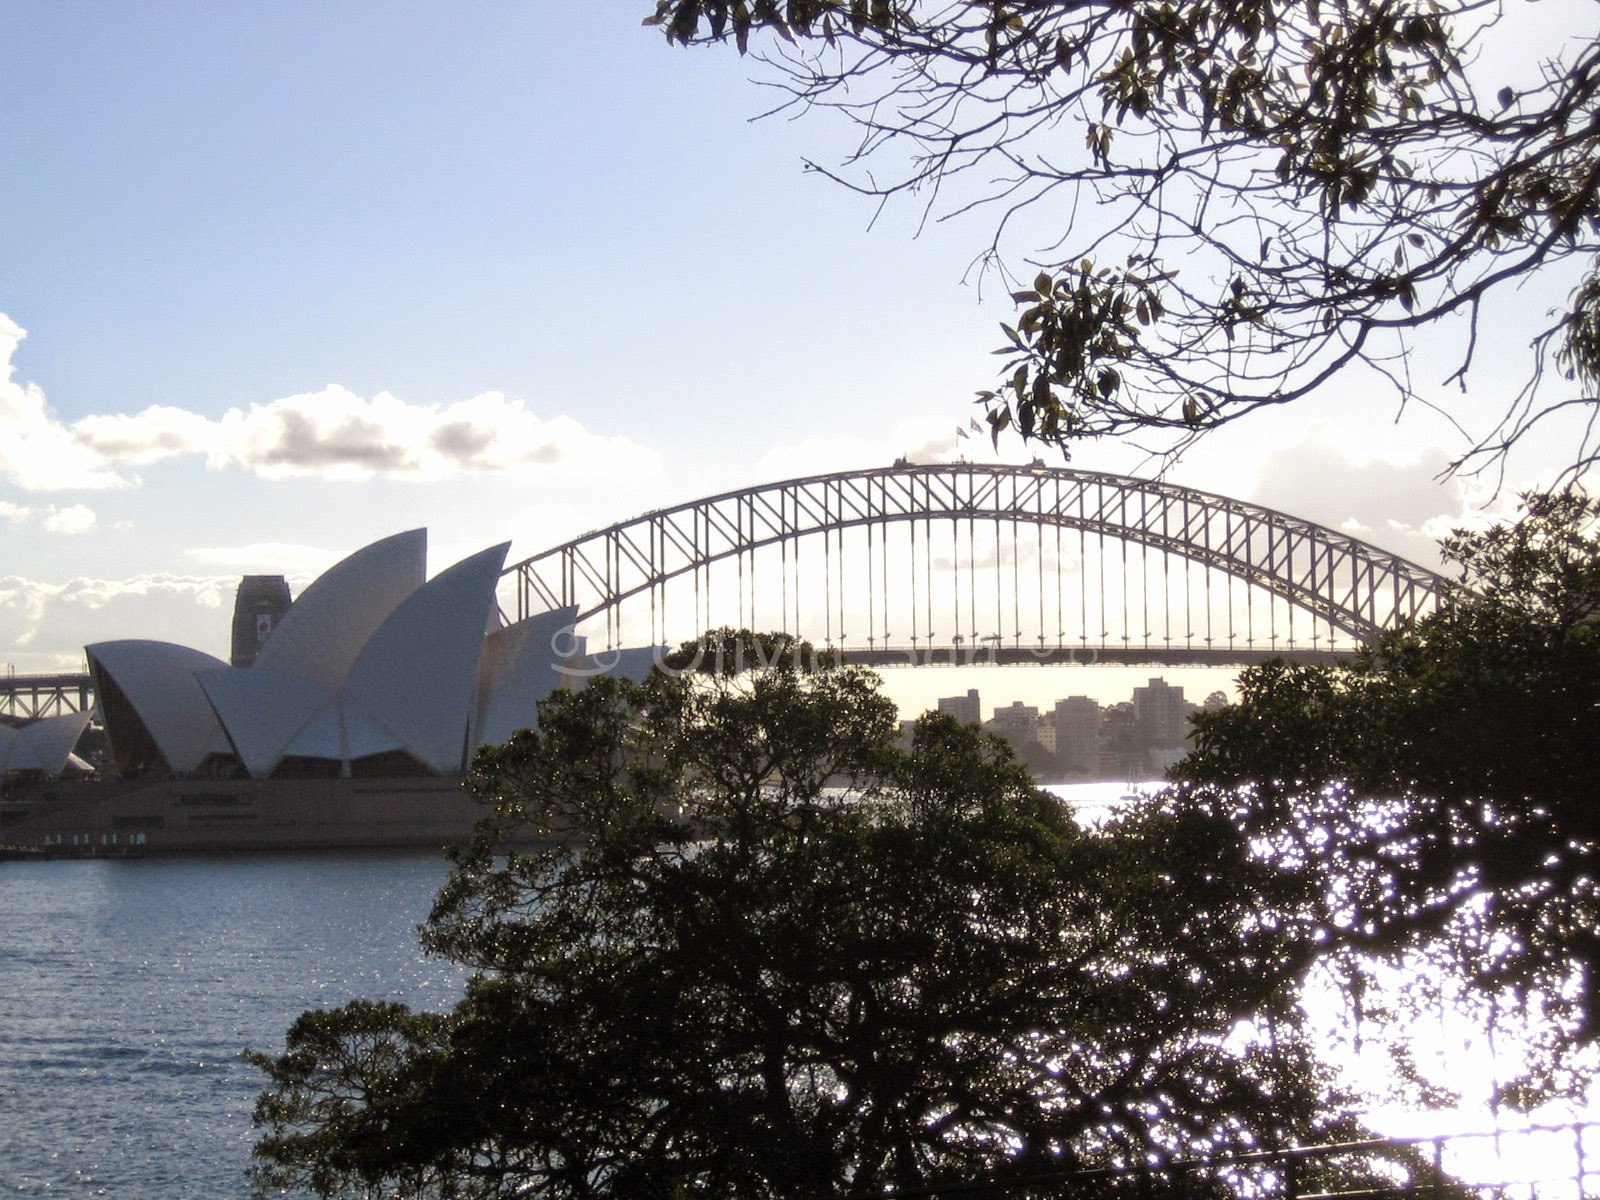 Sydney Harbour Bridge et Sydney Opera House, Royal Botanic Gardens, Sydney, Australie